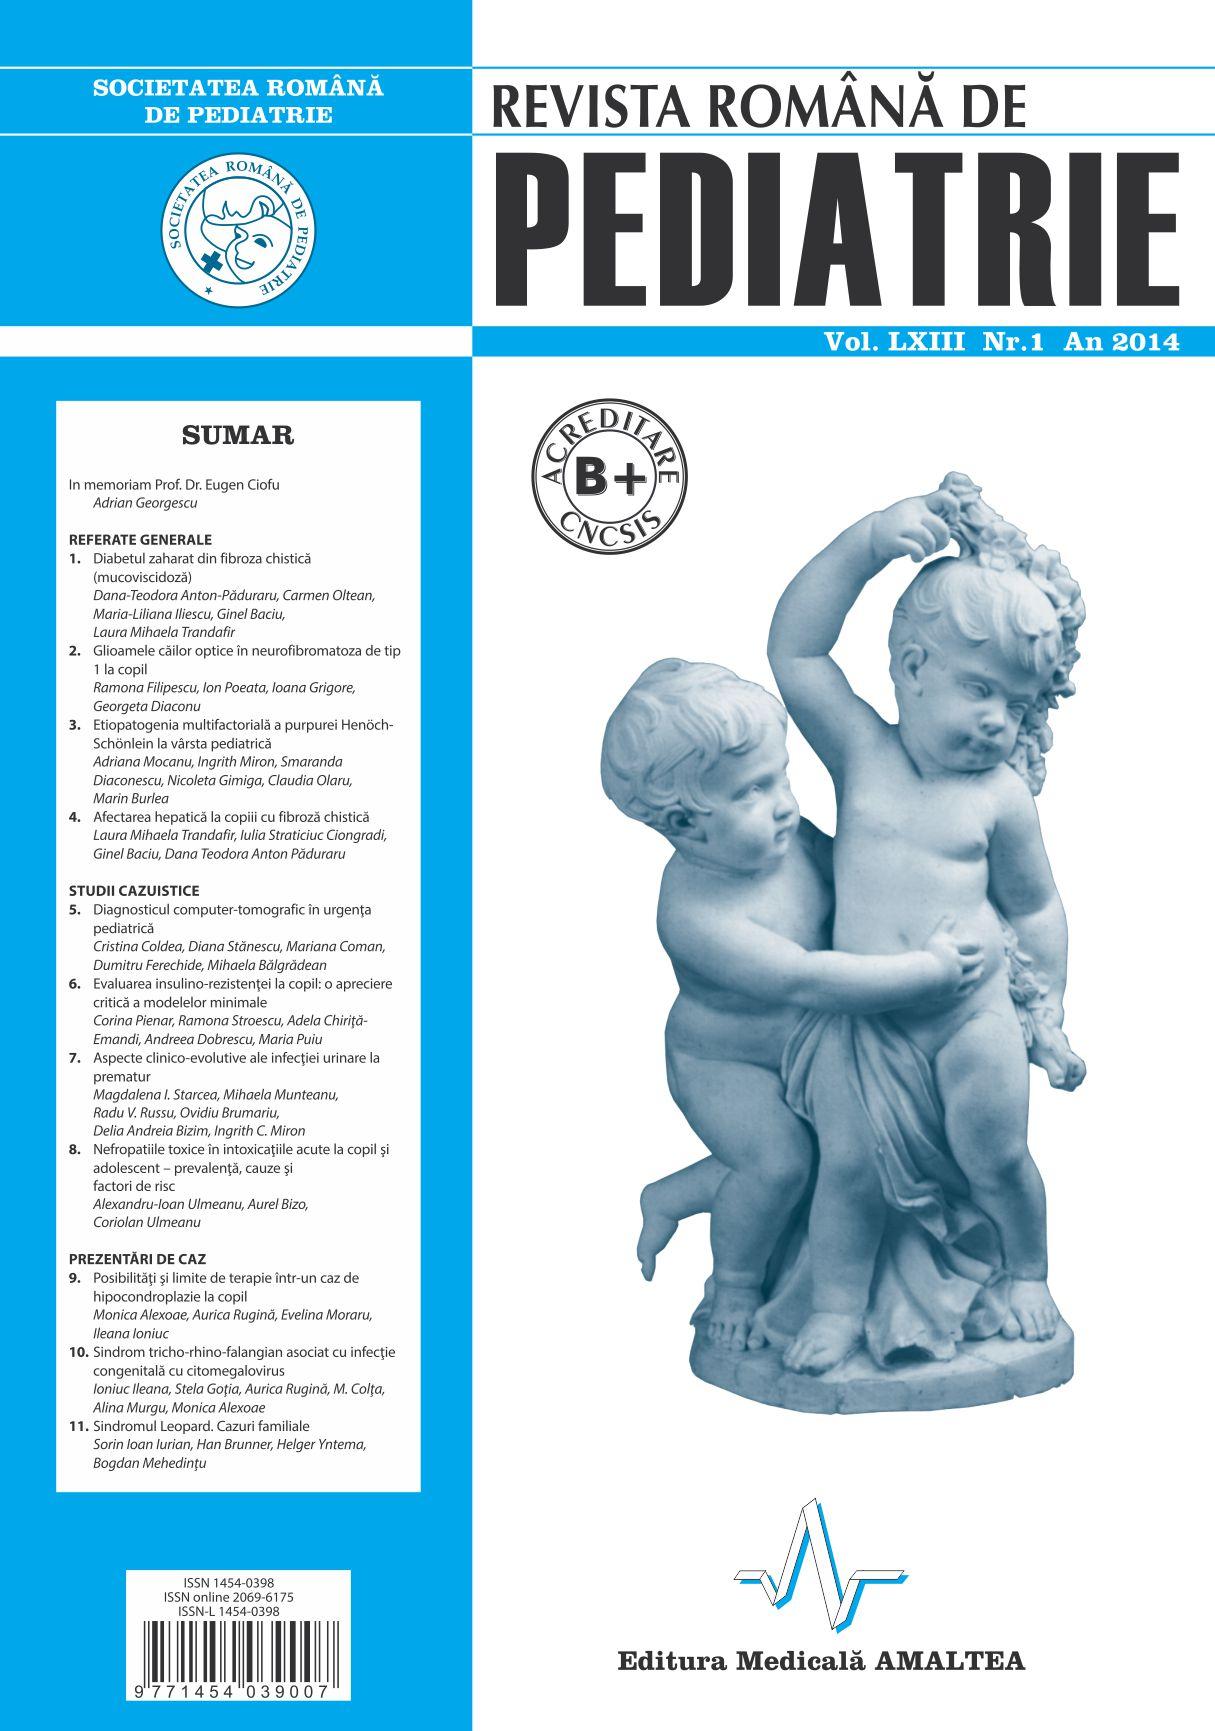 Revista Romana de PEDIATRIE | Volumul LXIII, Nr. 1, An 2014